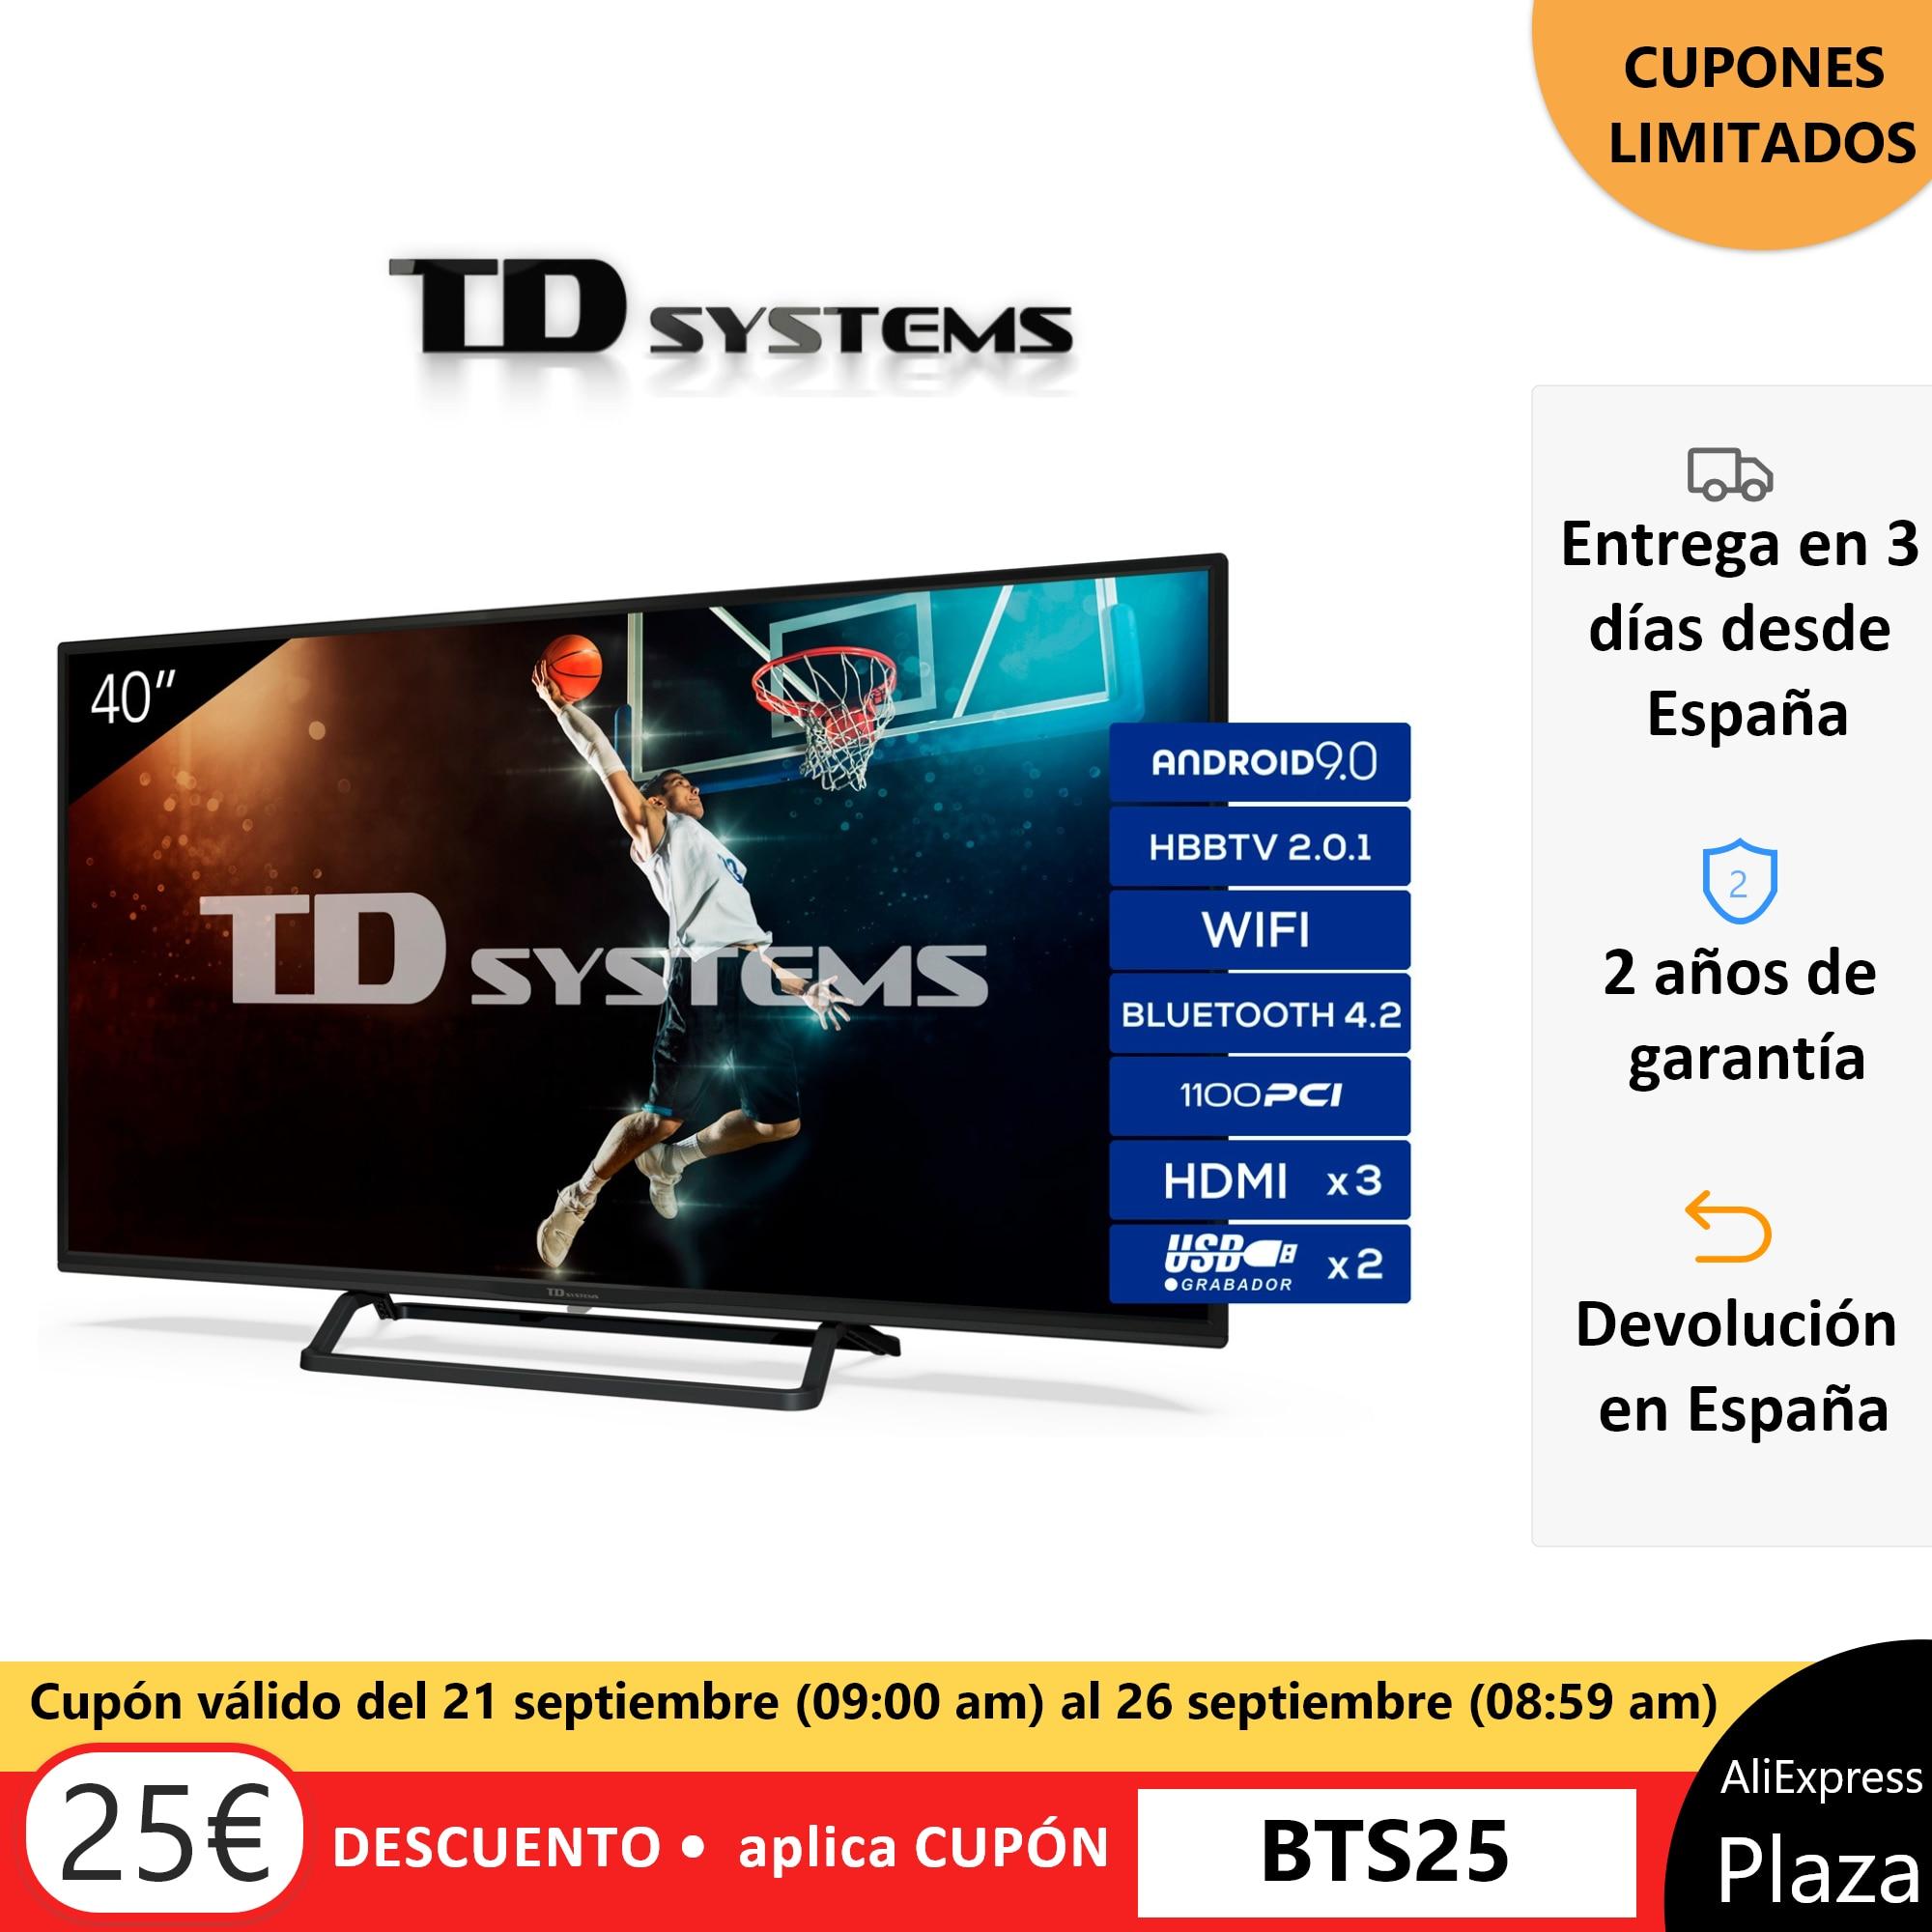 Televisores Smart TV 40 Pulgadas TD Systems K40DLX11FS  [Envío desde España, garantía de 2 años] 3x HDMI, DVB-T2